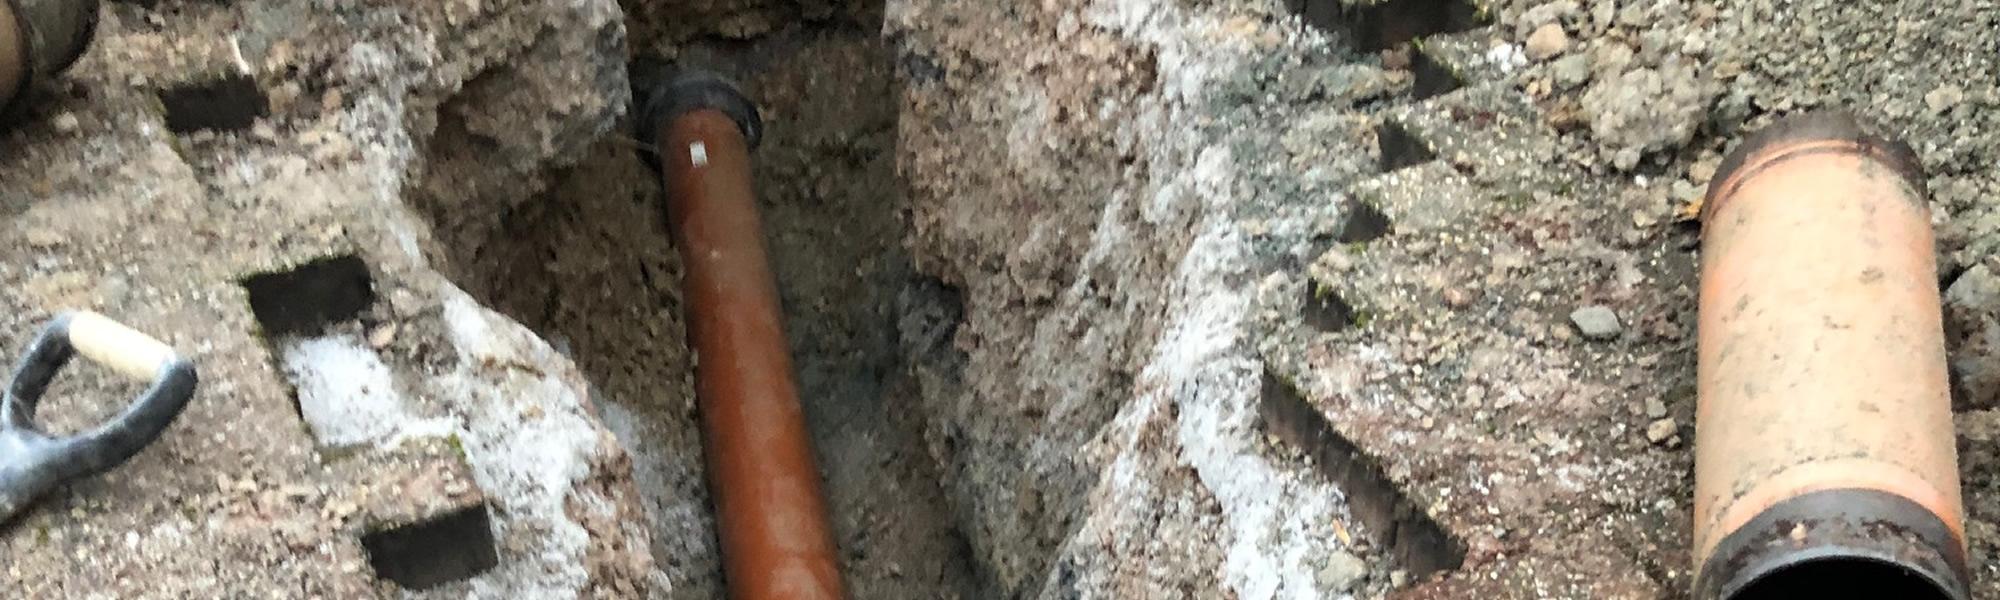 banner-drainage